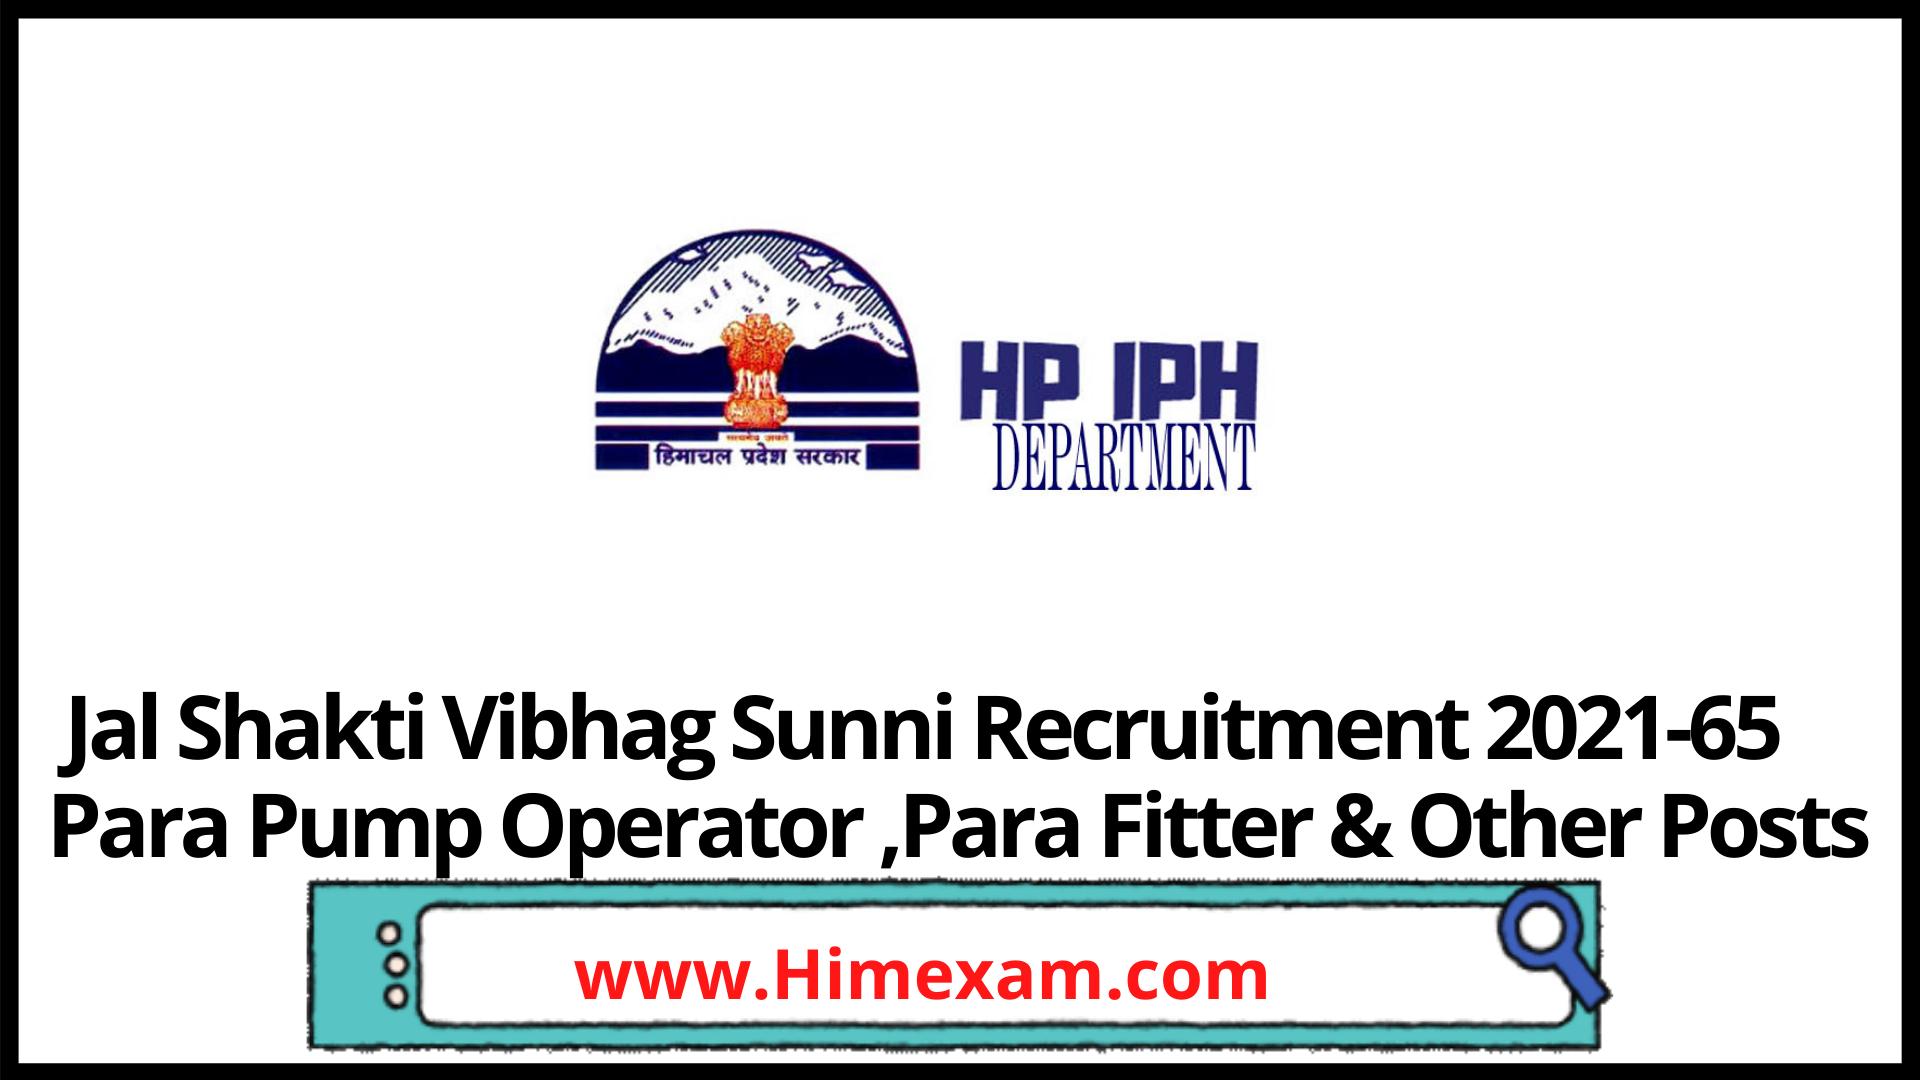 Jal Shakti Vibhag Sunni Recruitment 2021-65 Para Pump Operator ,Para Fitter & Other Posts